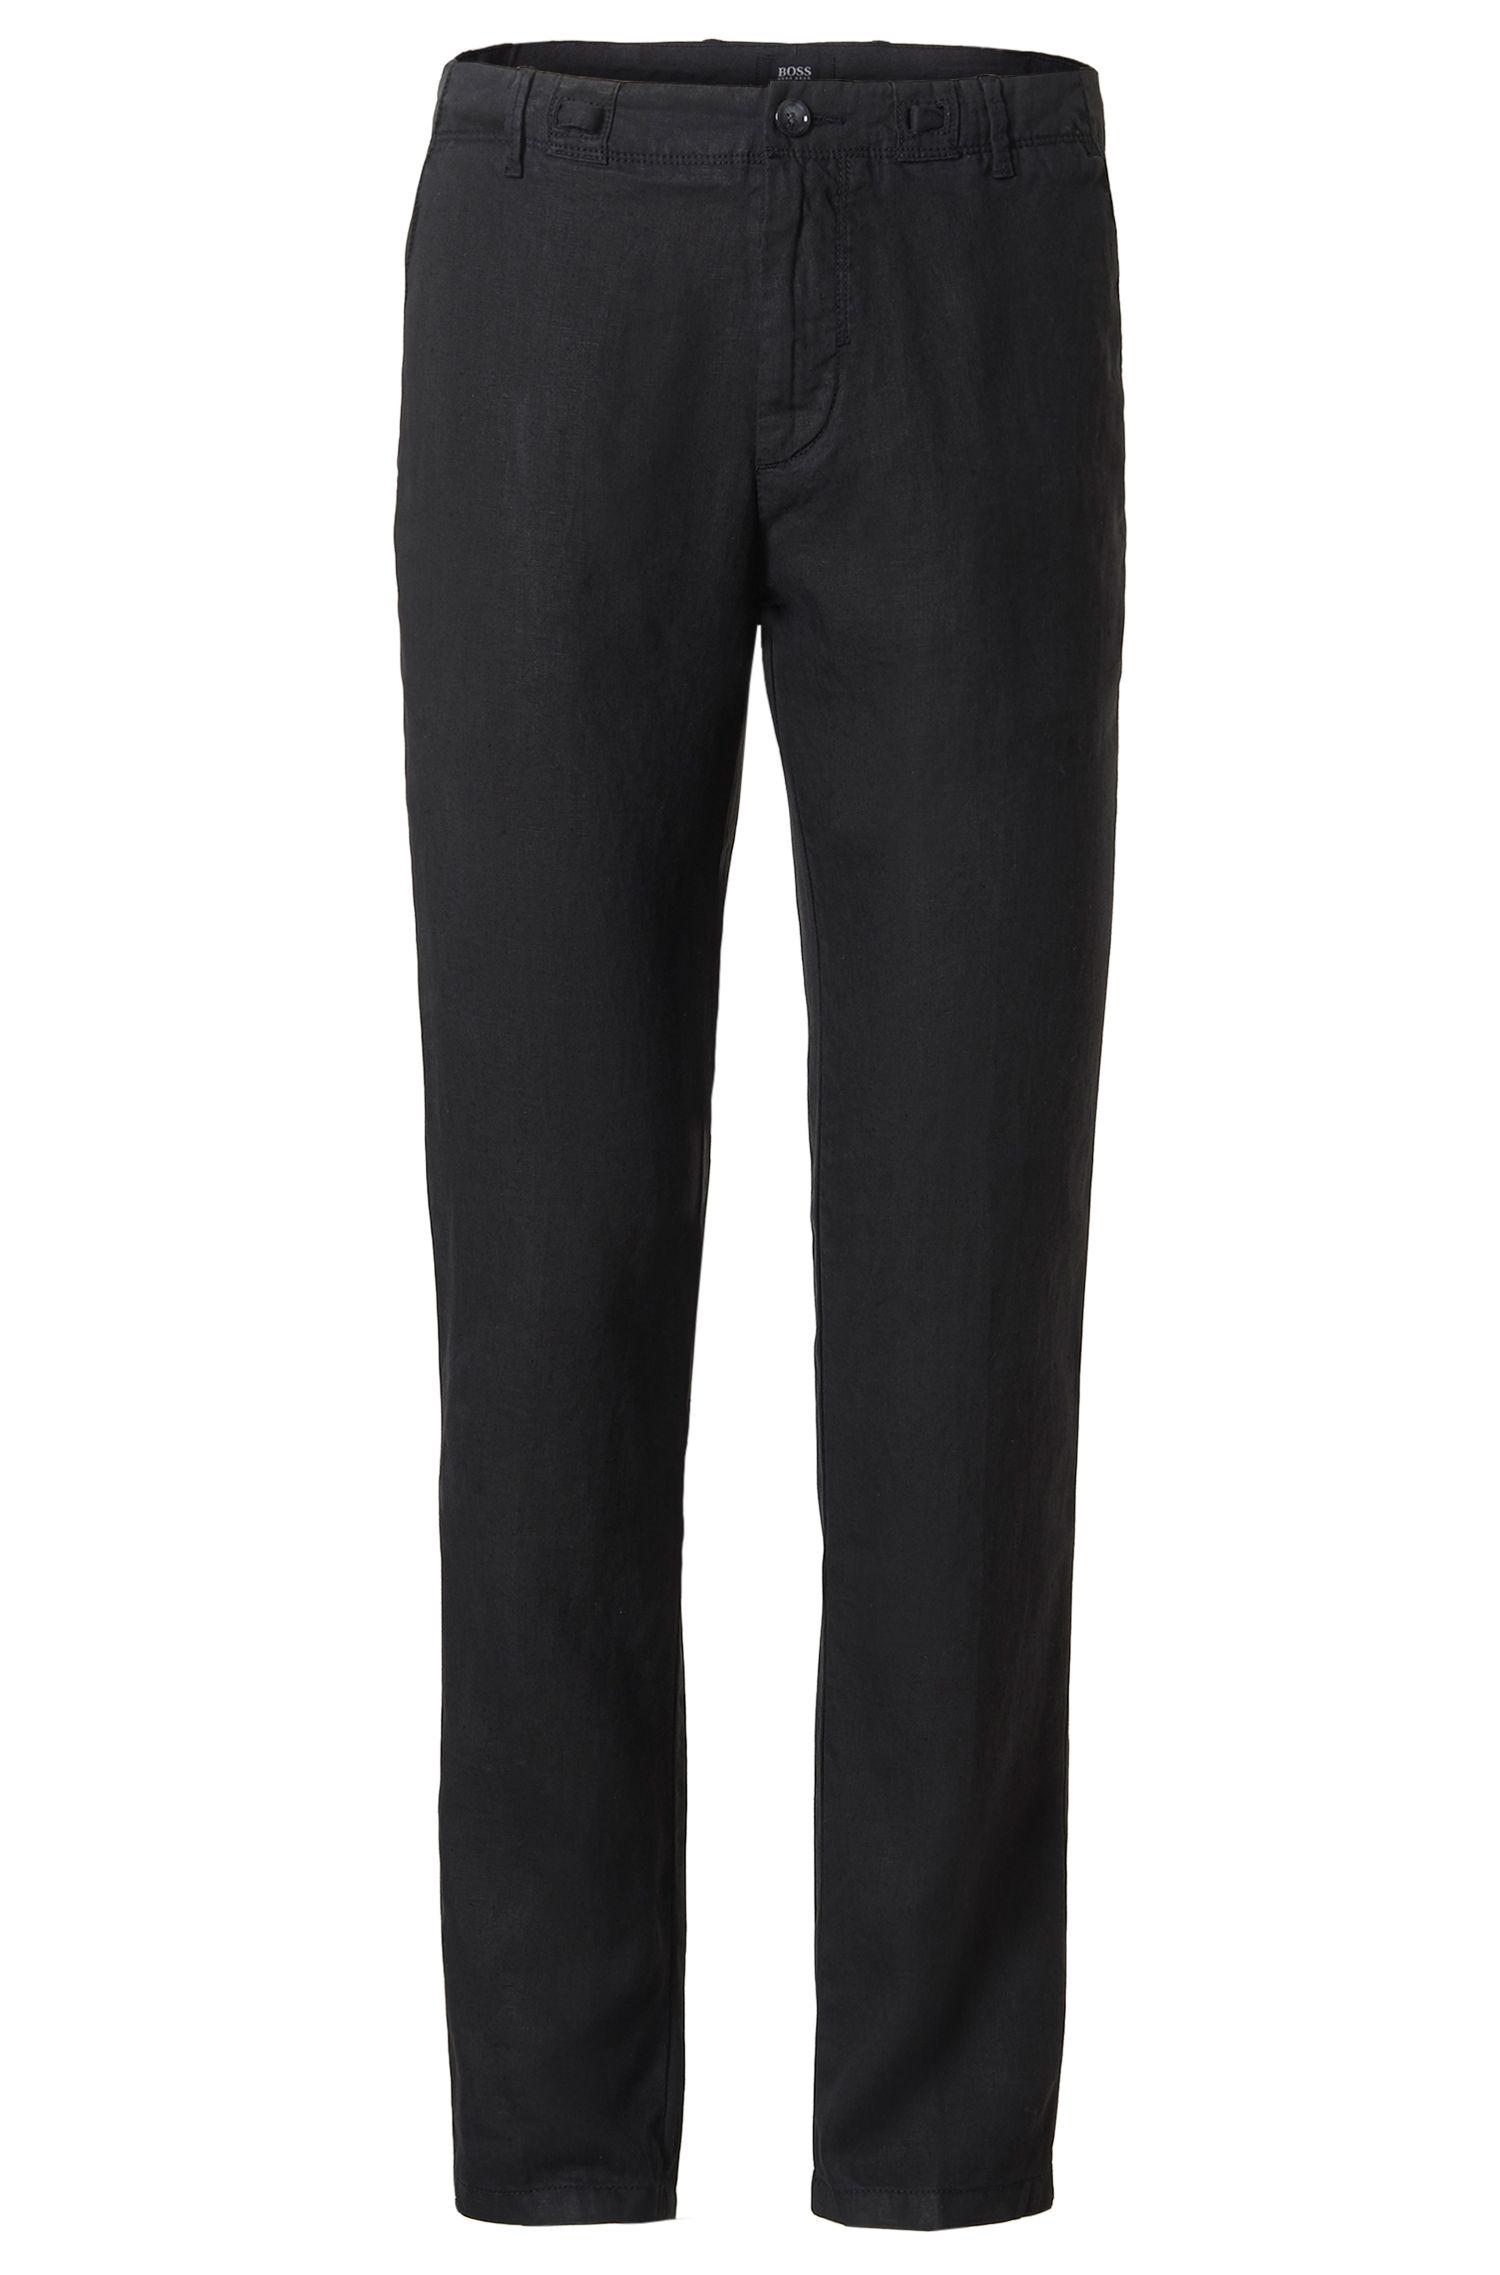 'Floyd-D' | Slim Fit, Linen Drawstring Pants